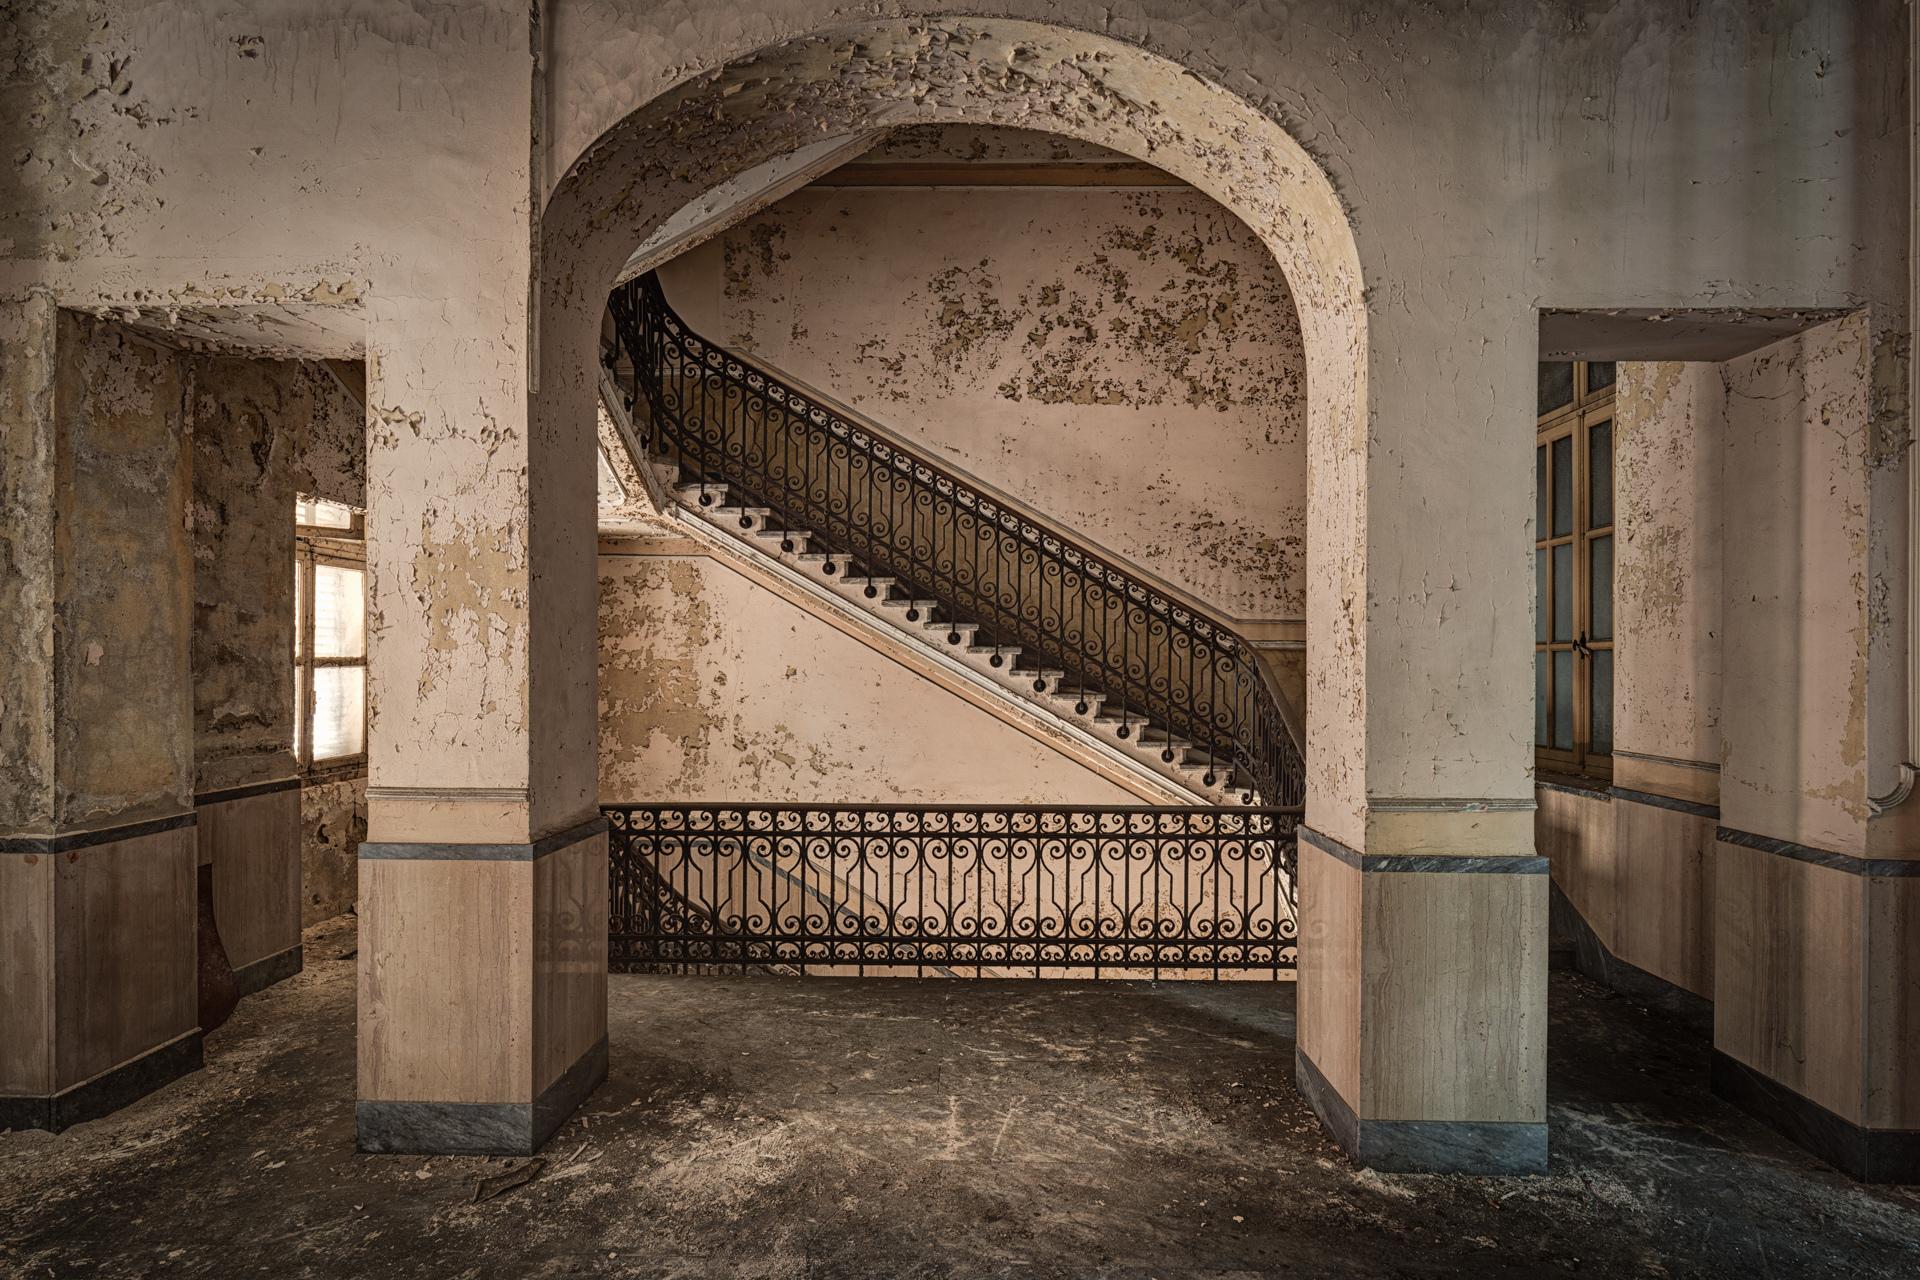 Urban Exploration - Manicomio Dr. Rossetti - Delicate Stairs